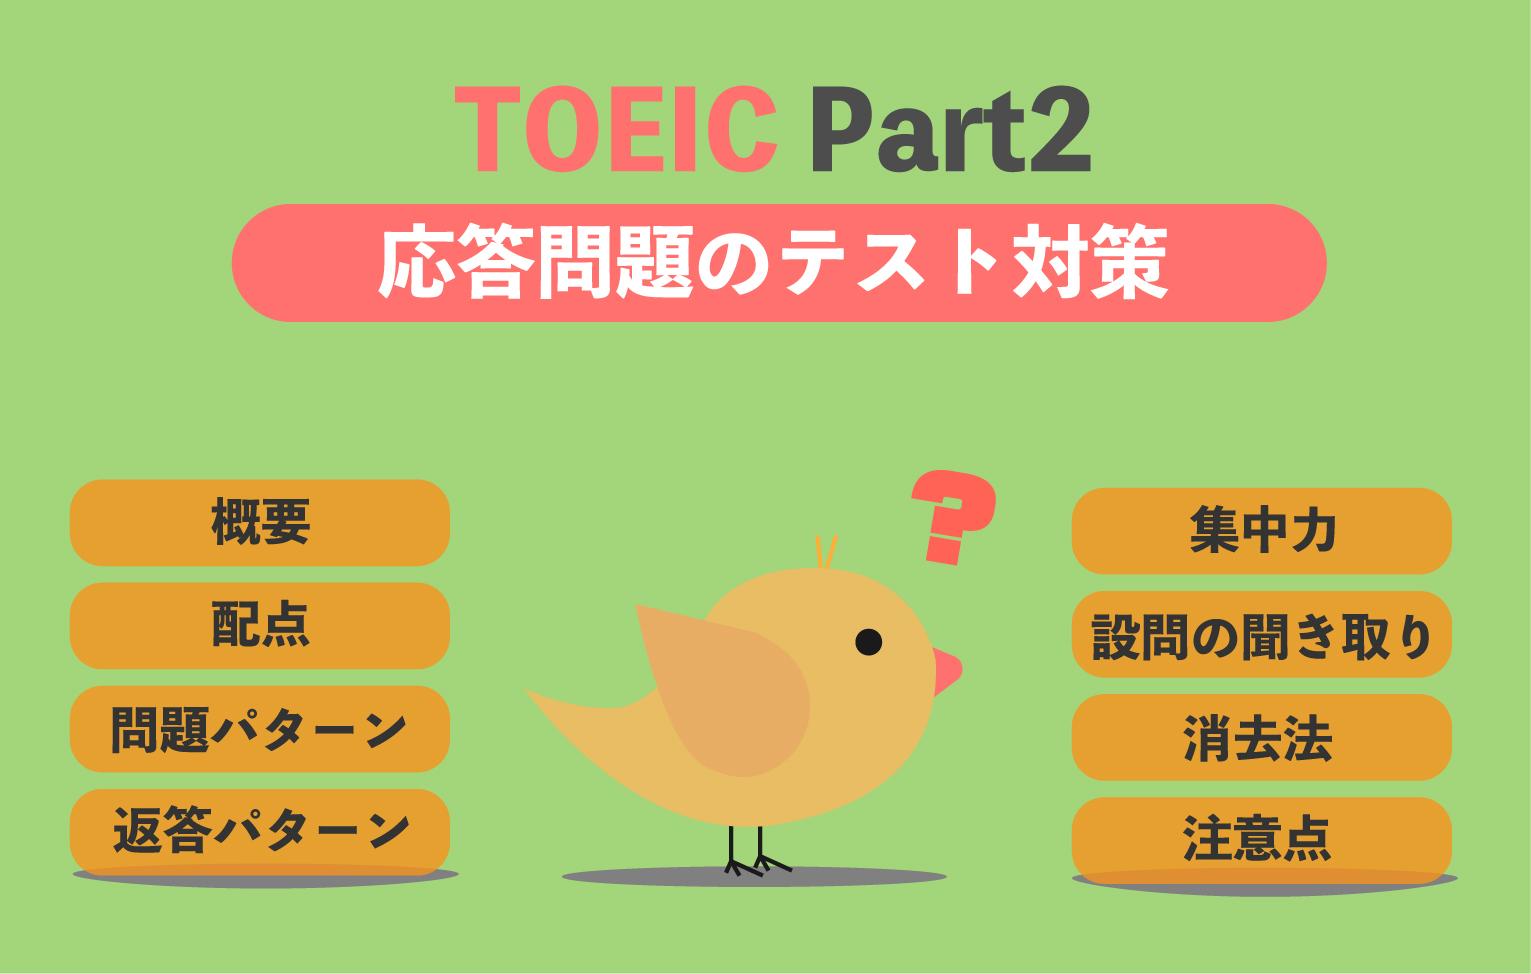 TOEIC Part2 応答問題のテスト対策と解き方のコツ